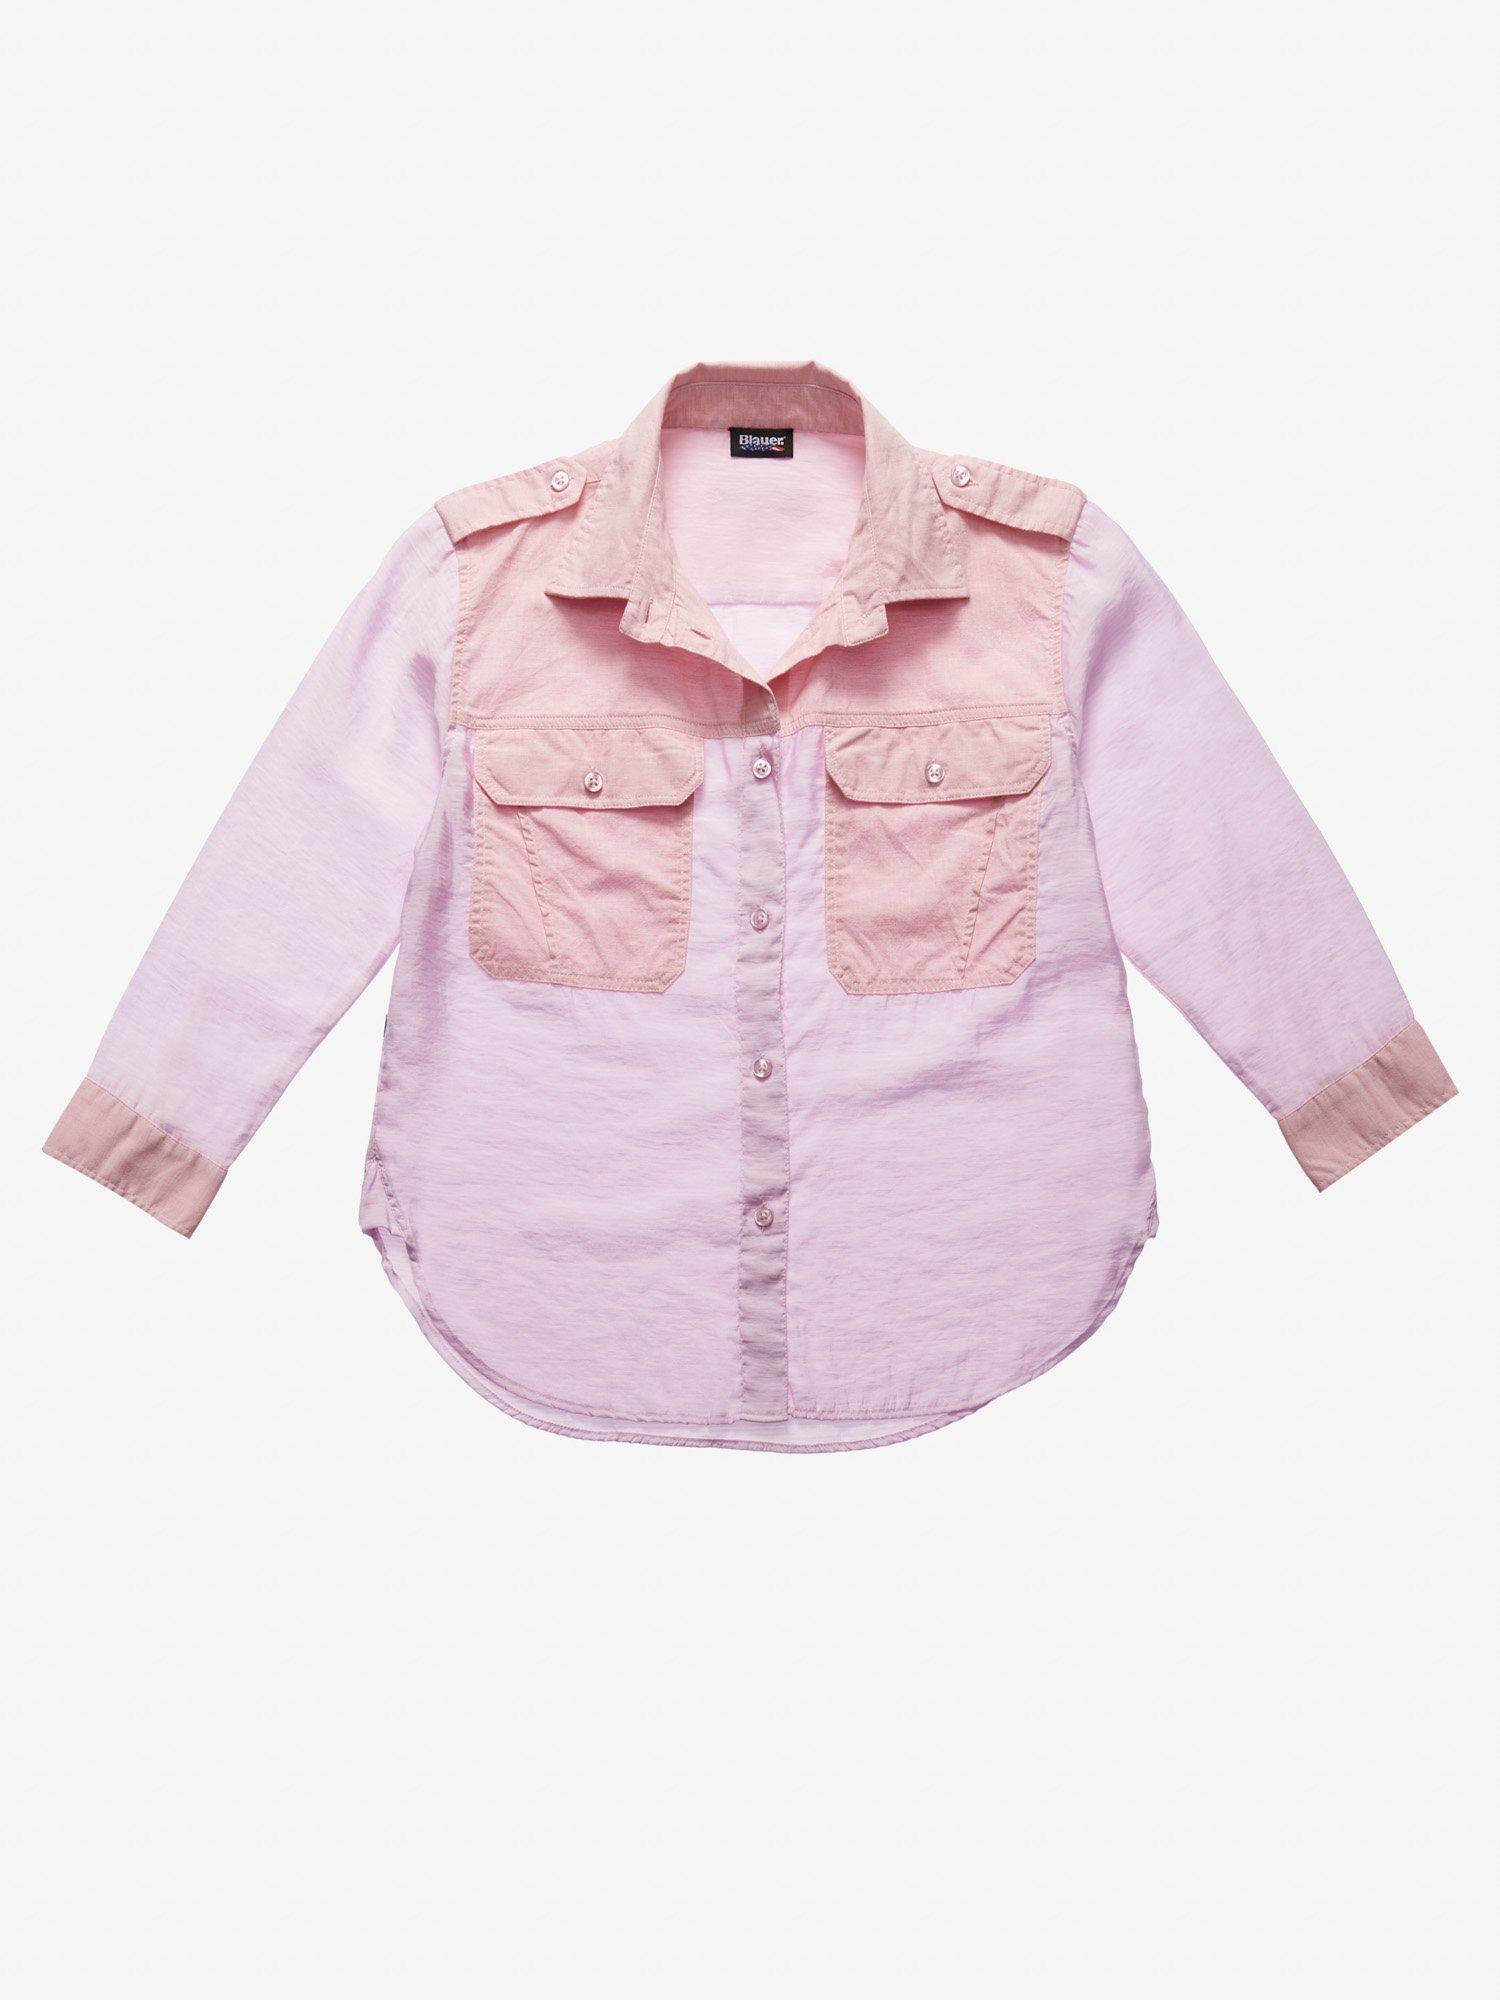 Blauer - WOMEN'S TONE-ON-TONE BICOLOUR SHIRT - Pink Pastel - Blauer